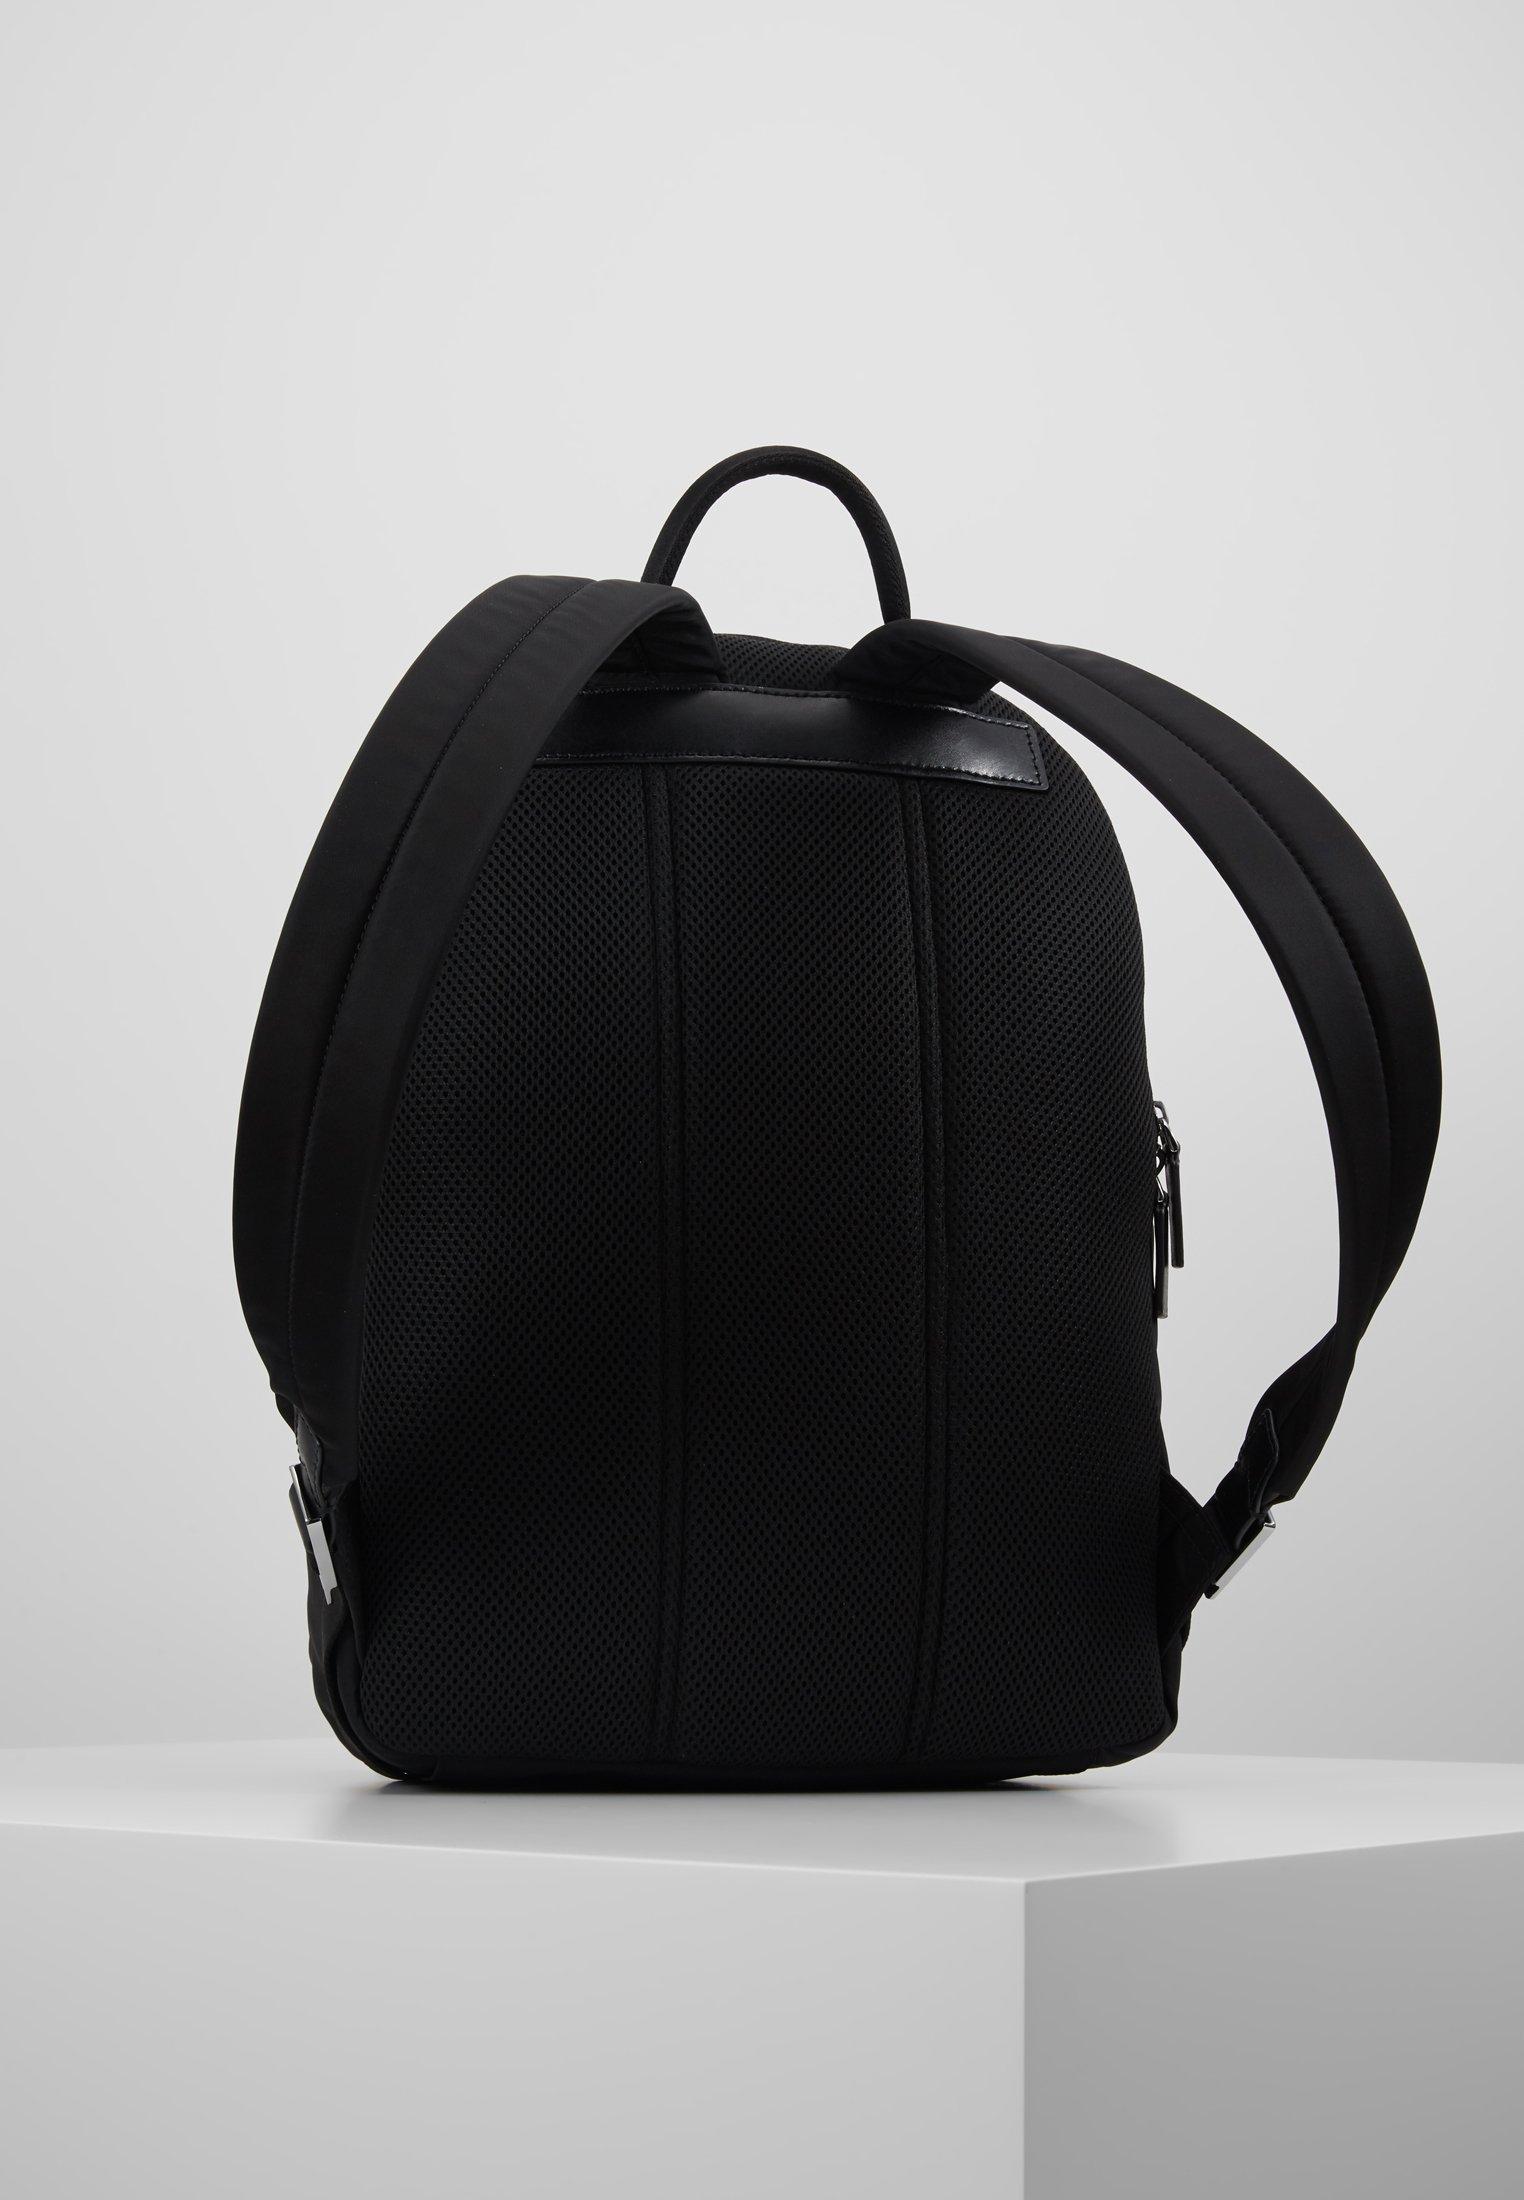 Michael Kors Tagesrucksack - black/schwarz - Herrentaschen Ed1Wg